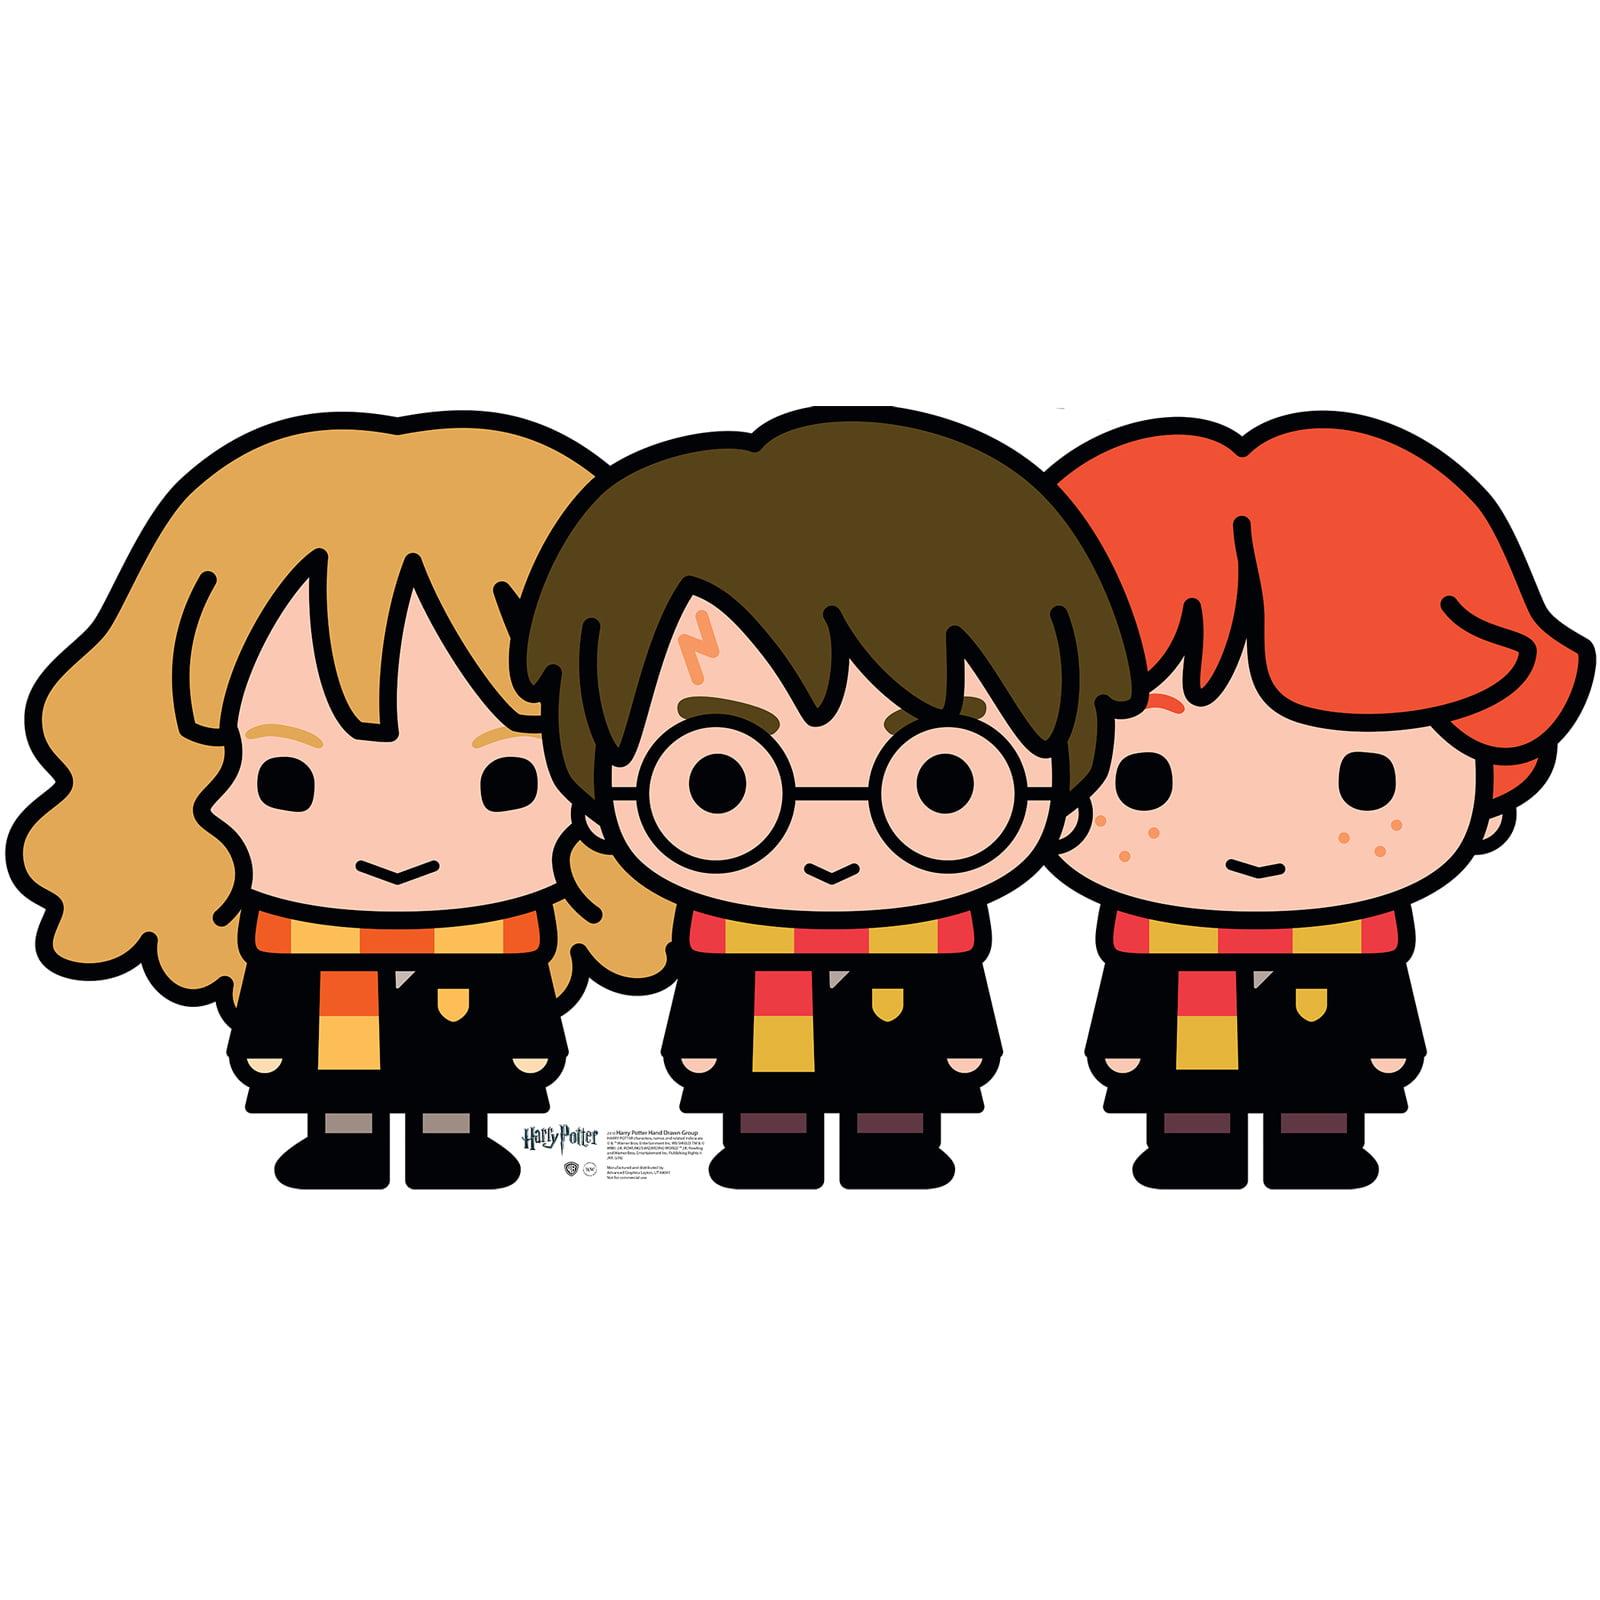 Harry Potter Emoji Standup - Walmart.com - Walmart.com